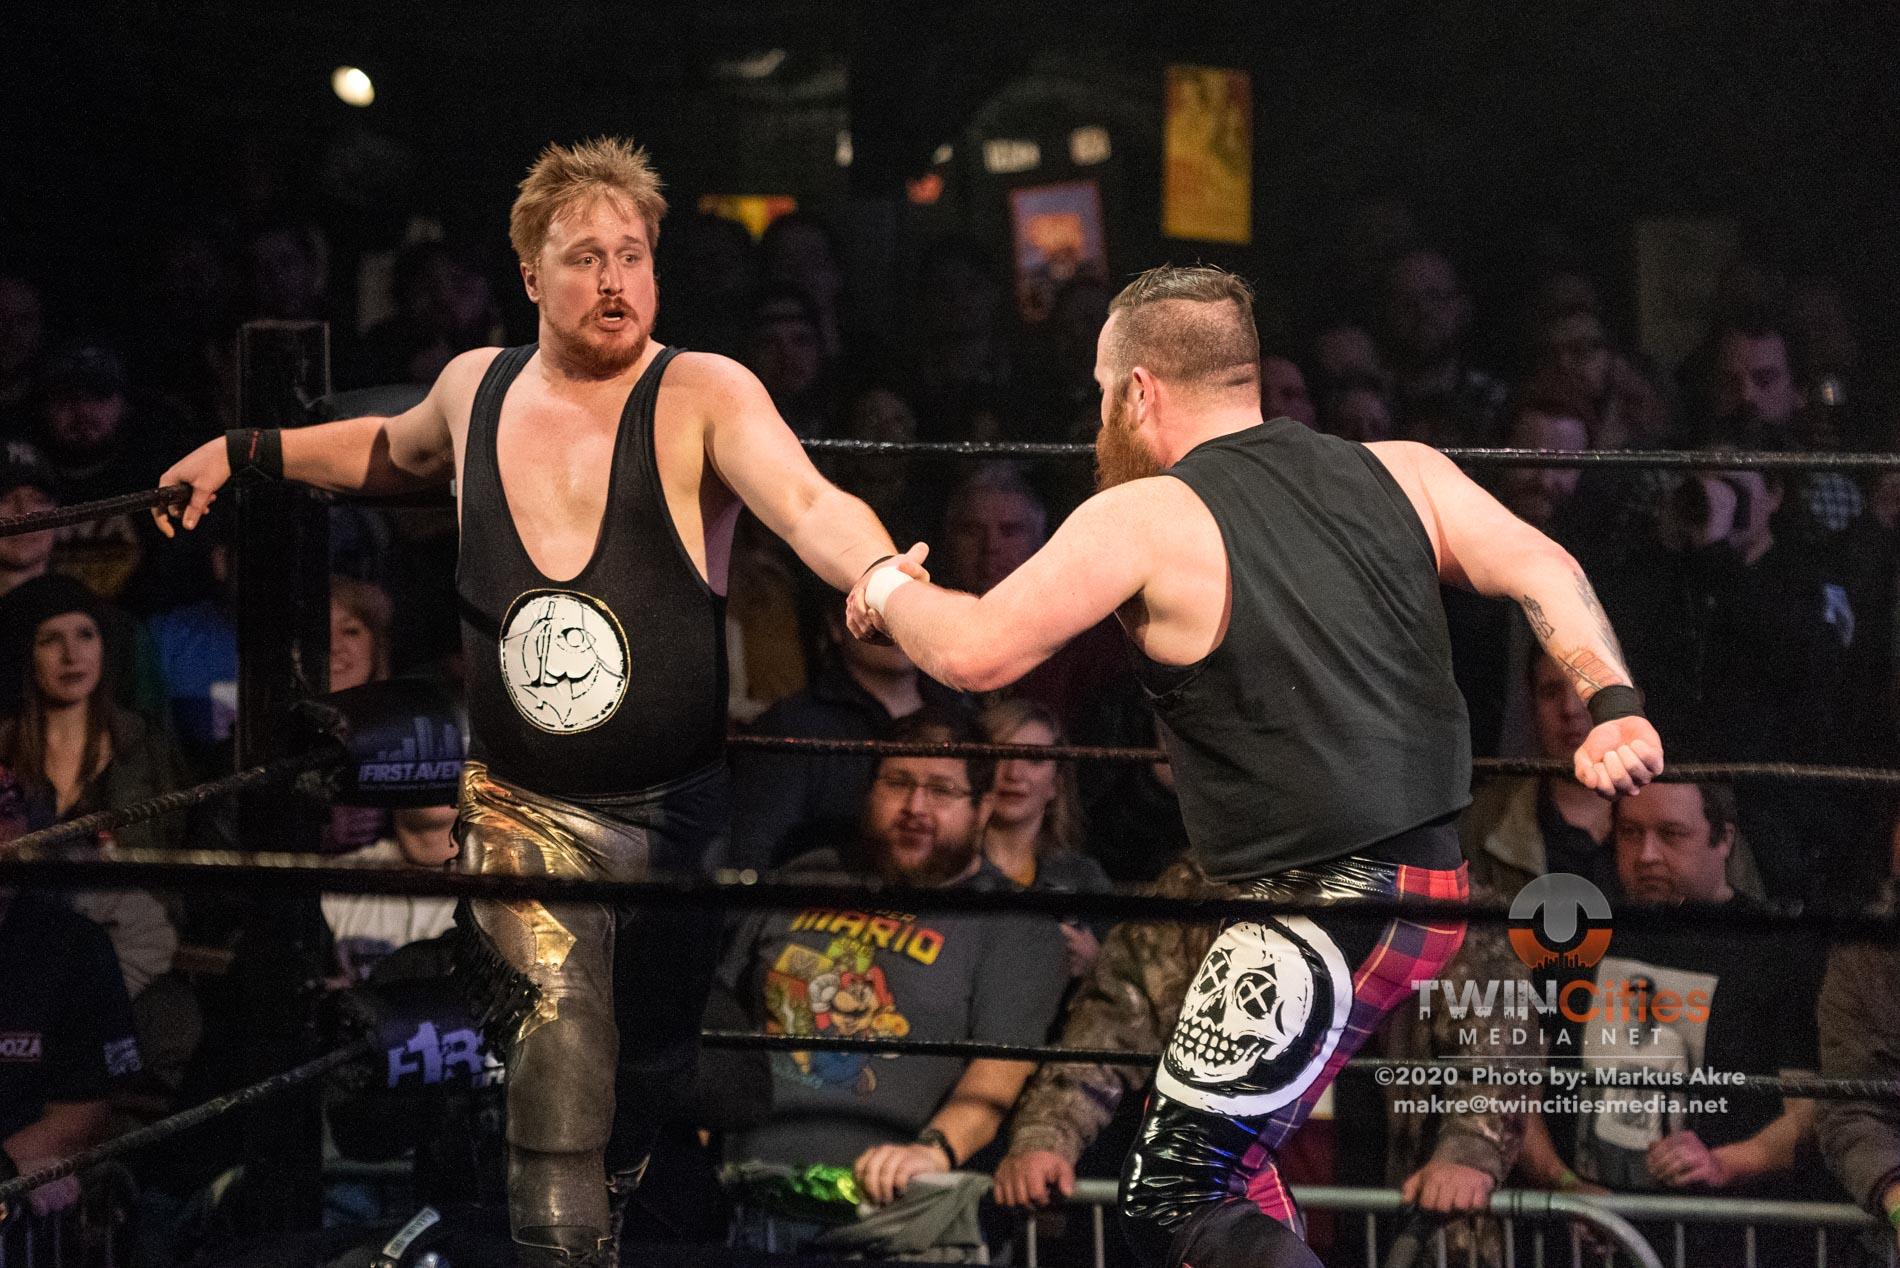 Wrestlepalooza-Day-2-2